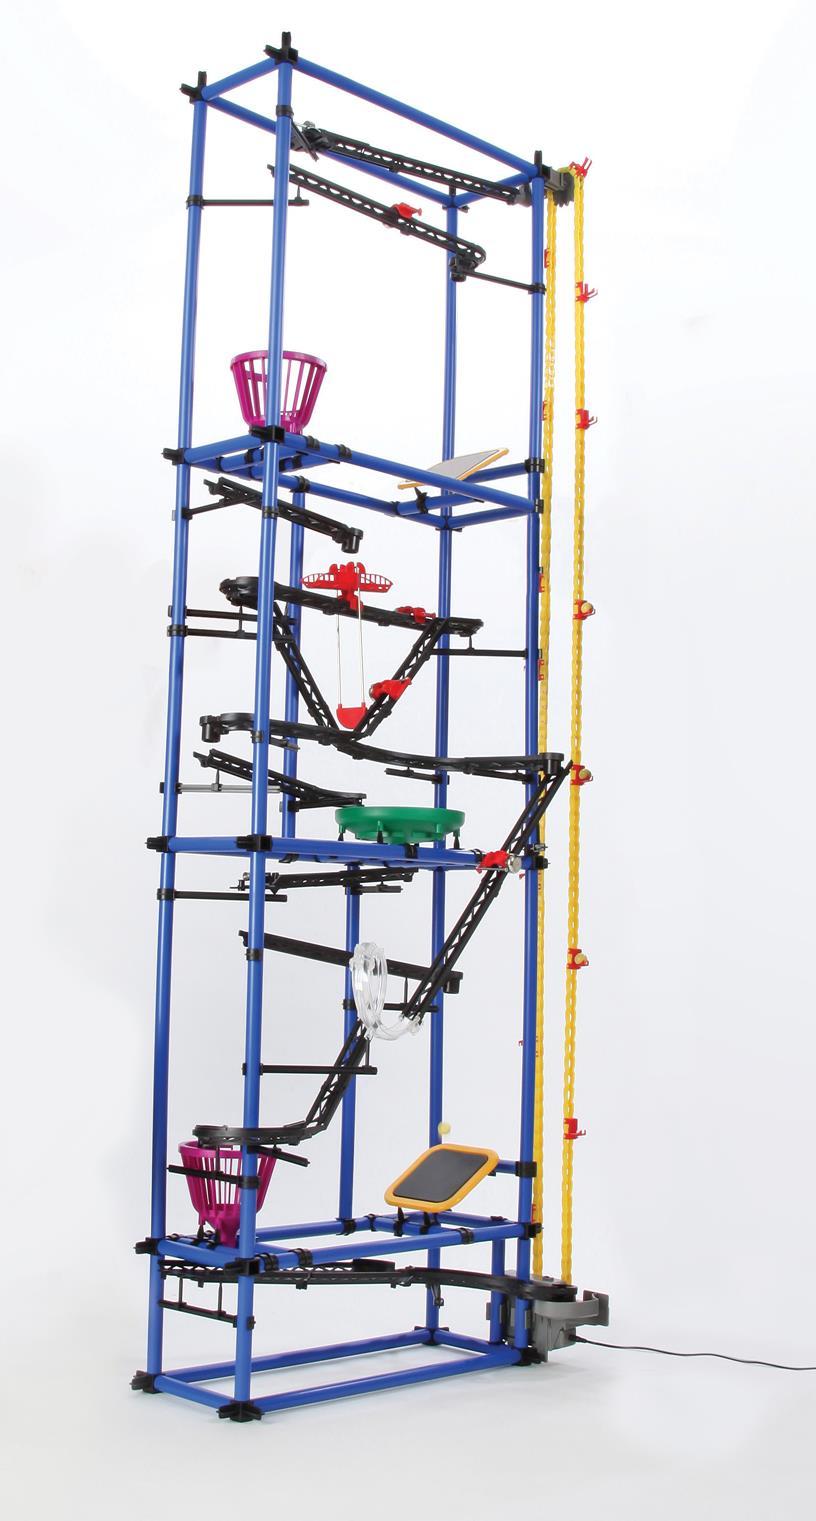 The Chaos Tower Scientificsonline